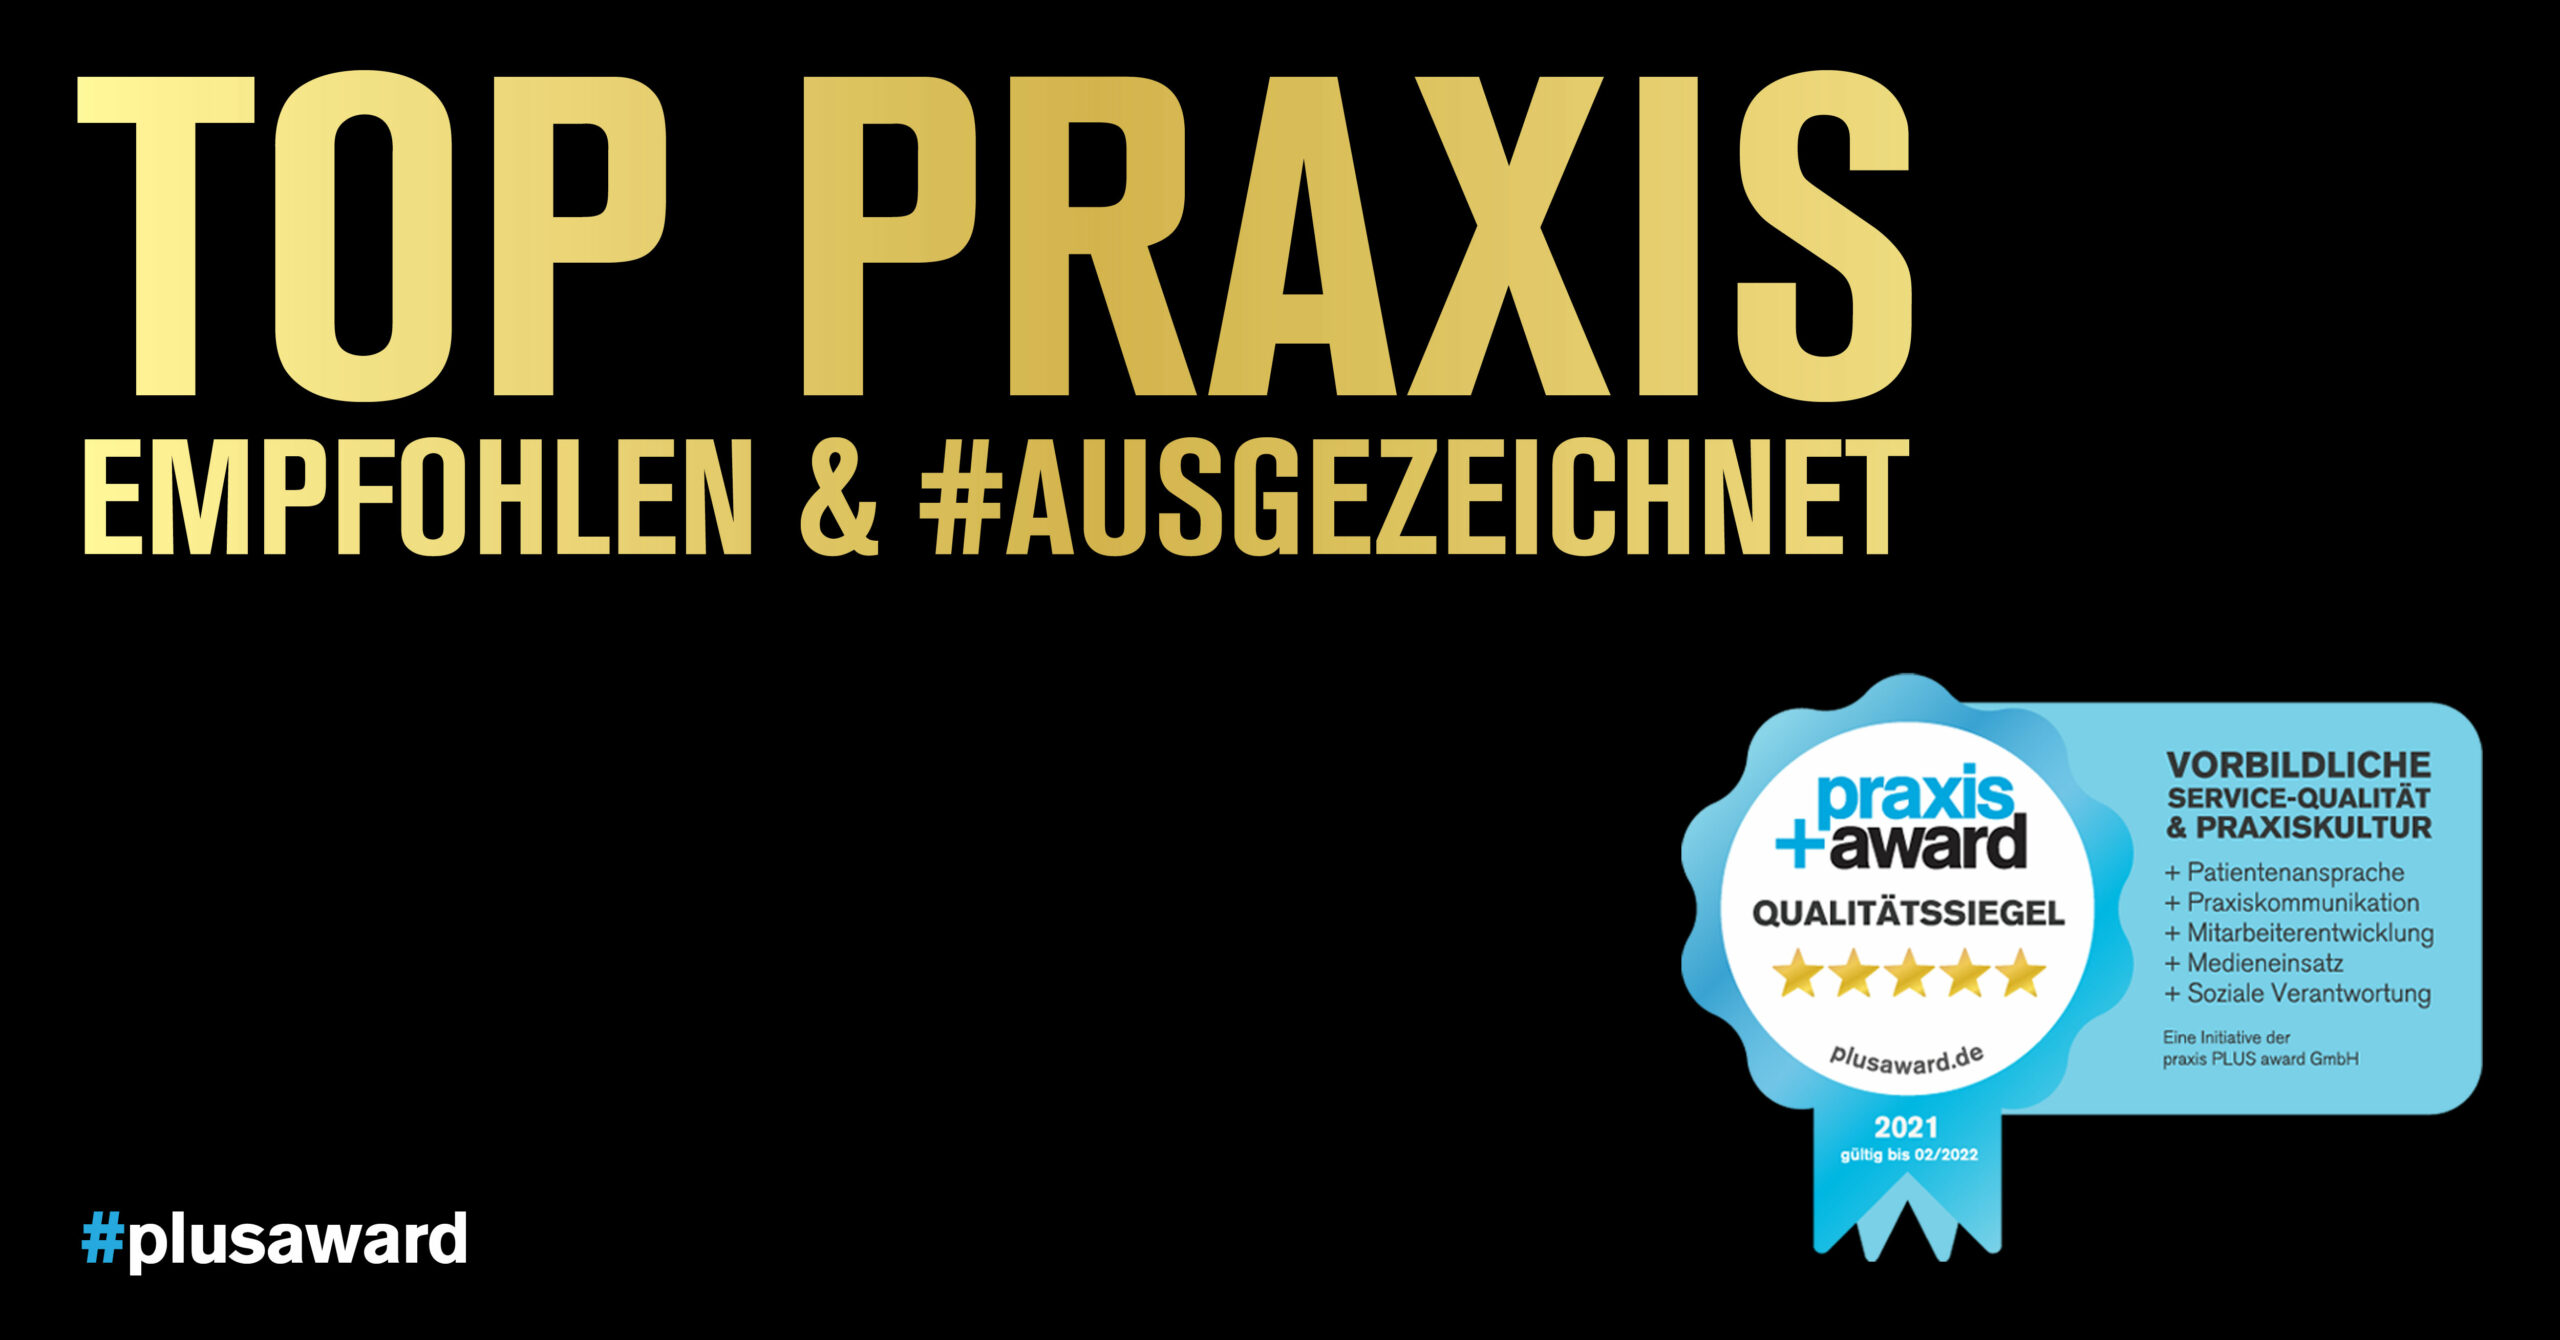 PRAXIS+Award 5-Sterne Qualitätssiegel